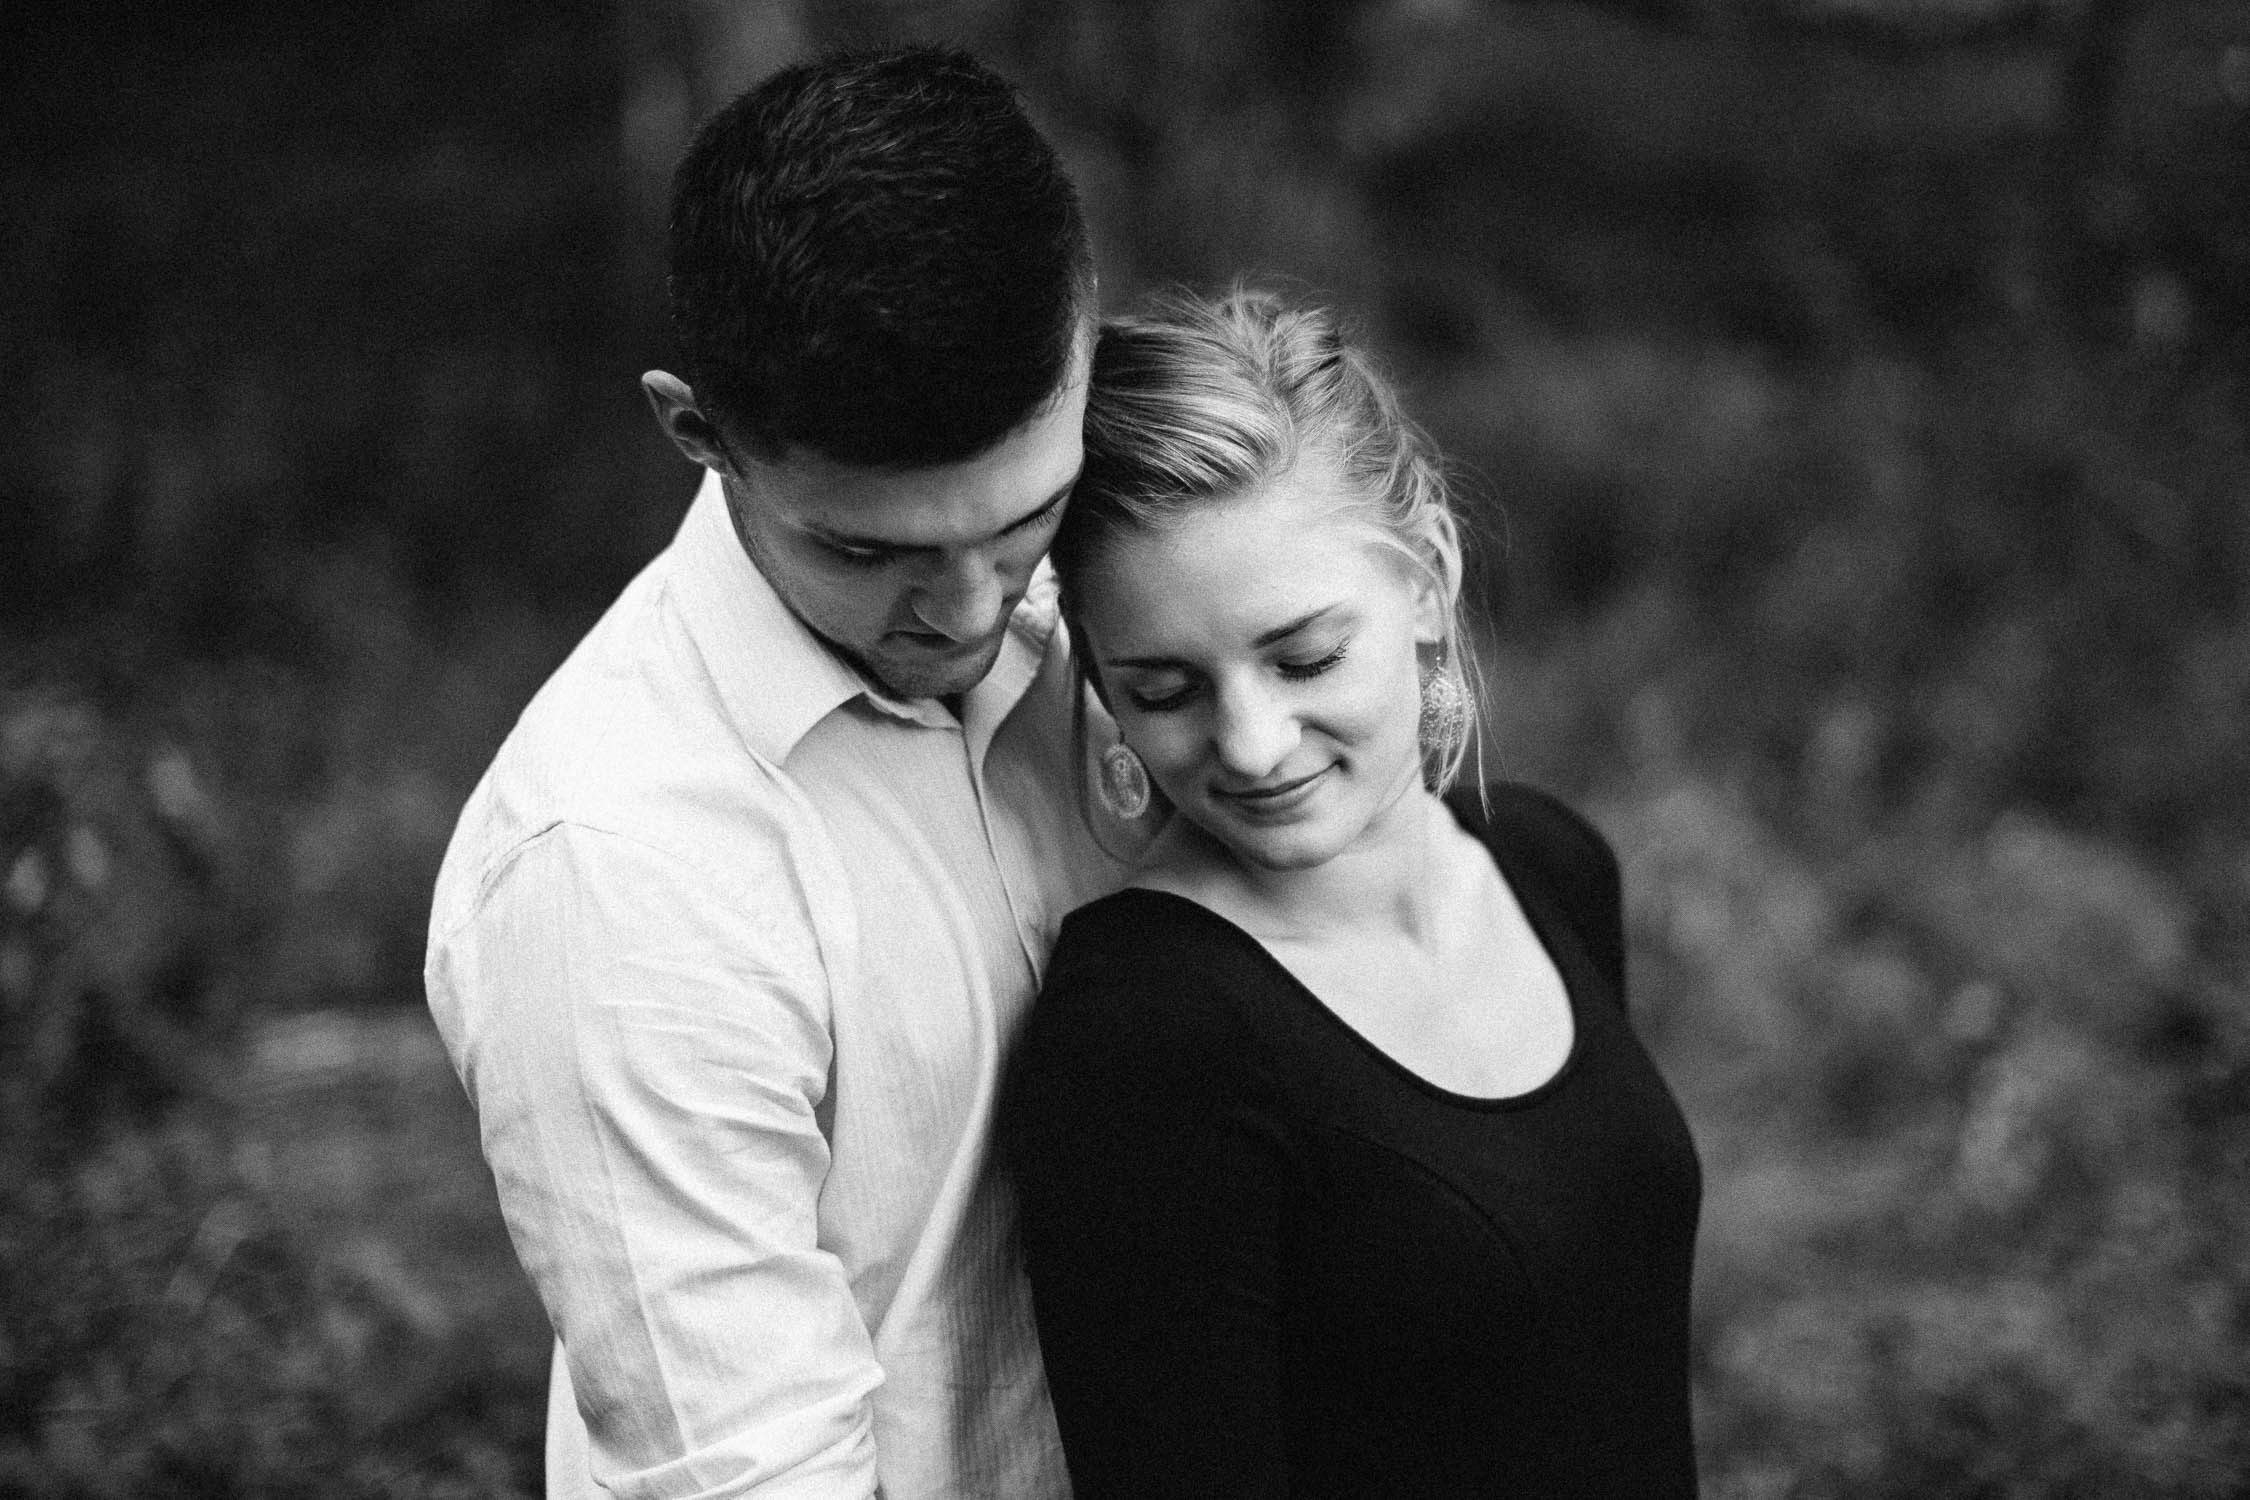 Romantic_Timeless_Downtown_SiouxFalls_Engagement_Wedding_Photographer_40.jpg